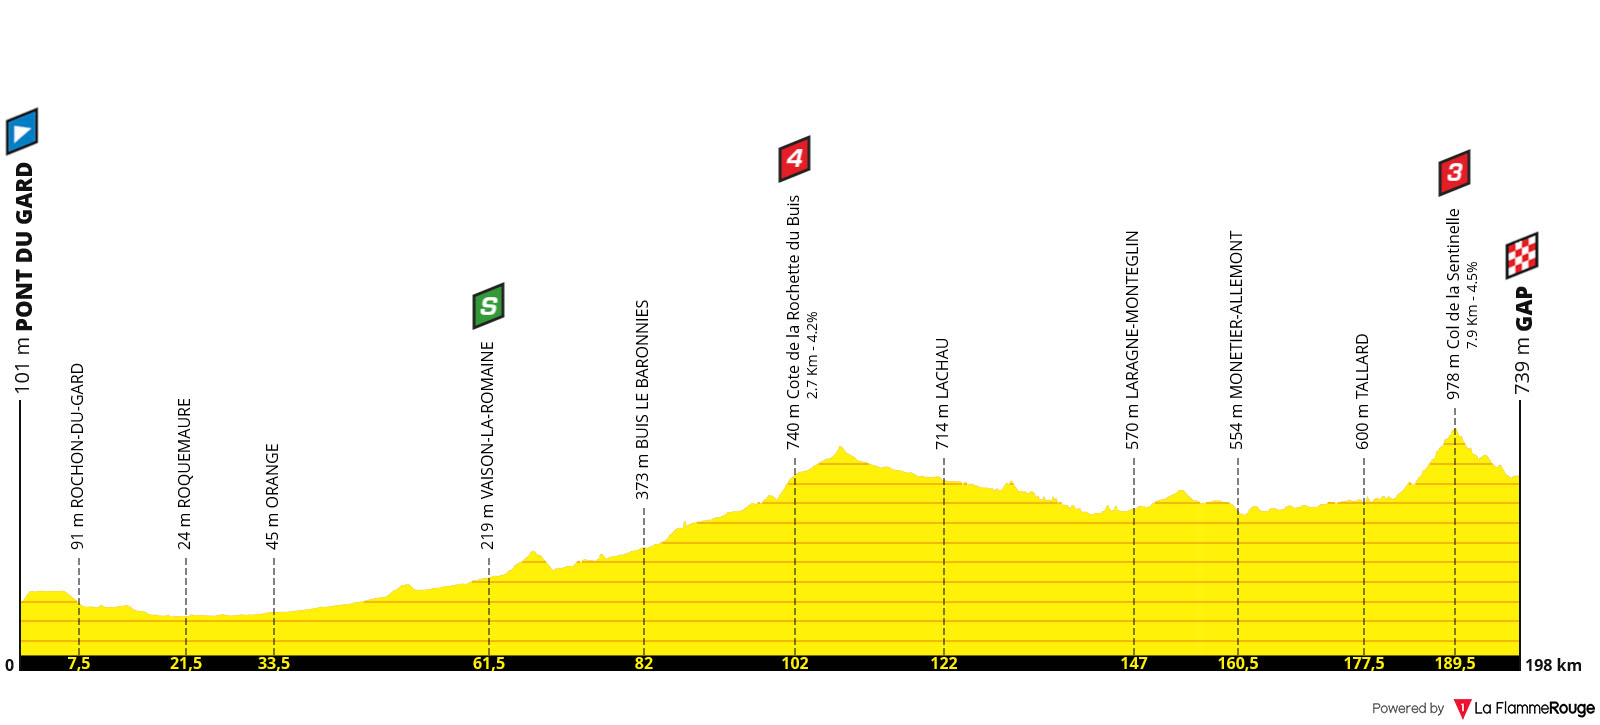 Perfil Etapa 17 - Tour de Francia 2019